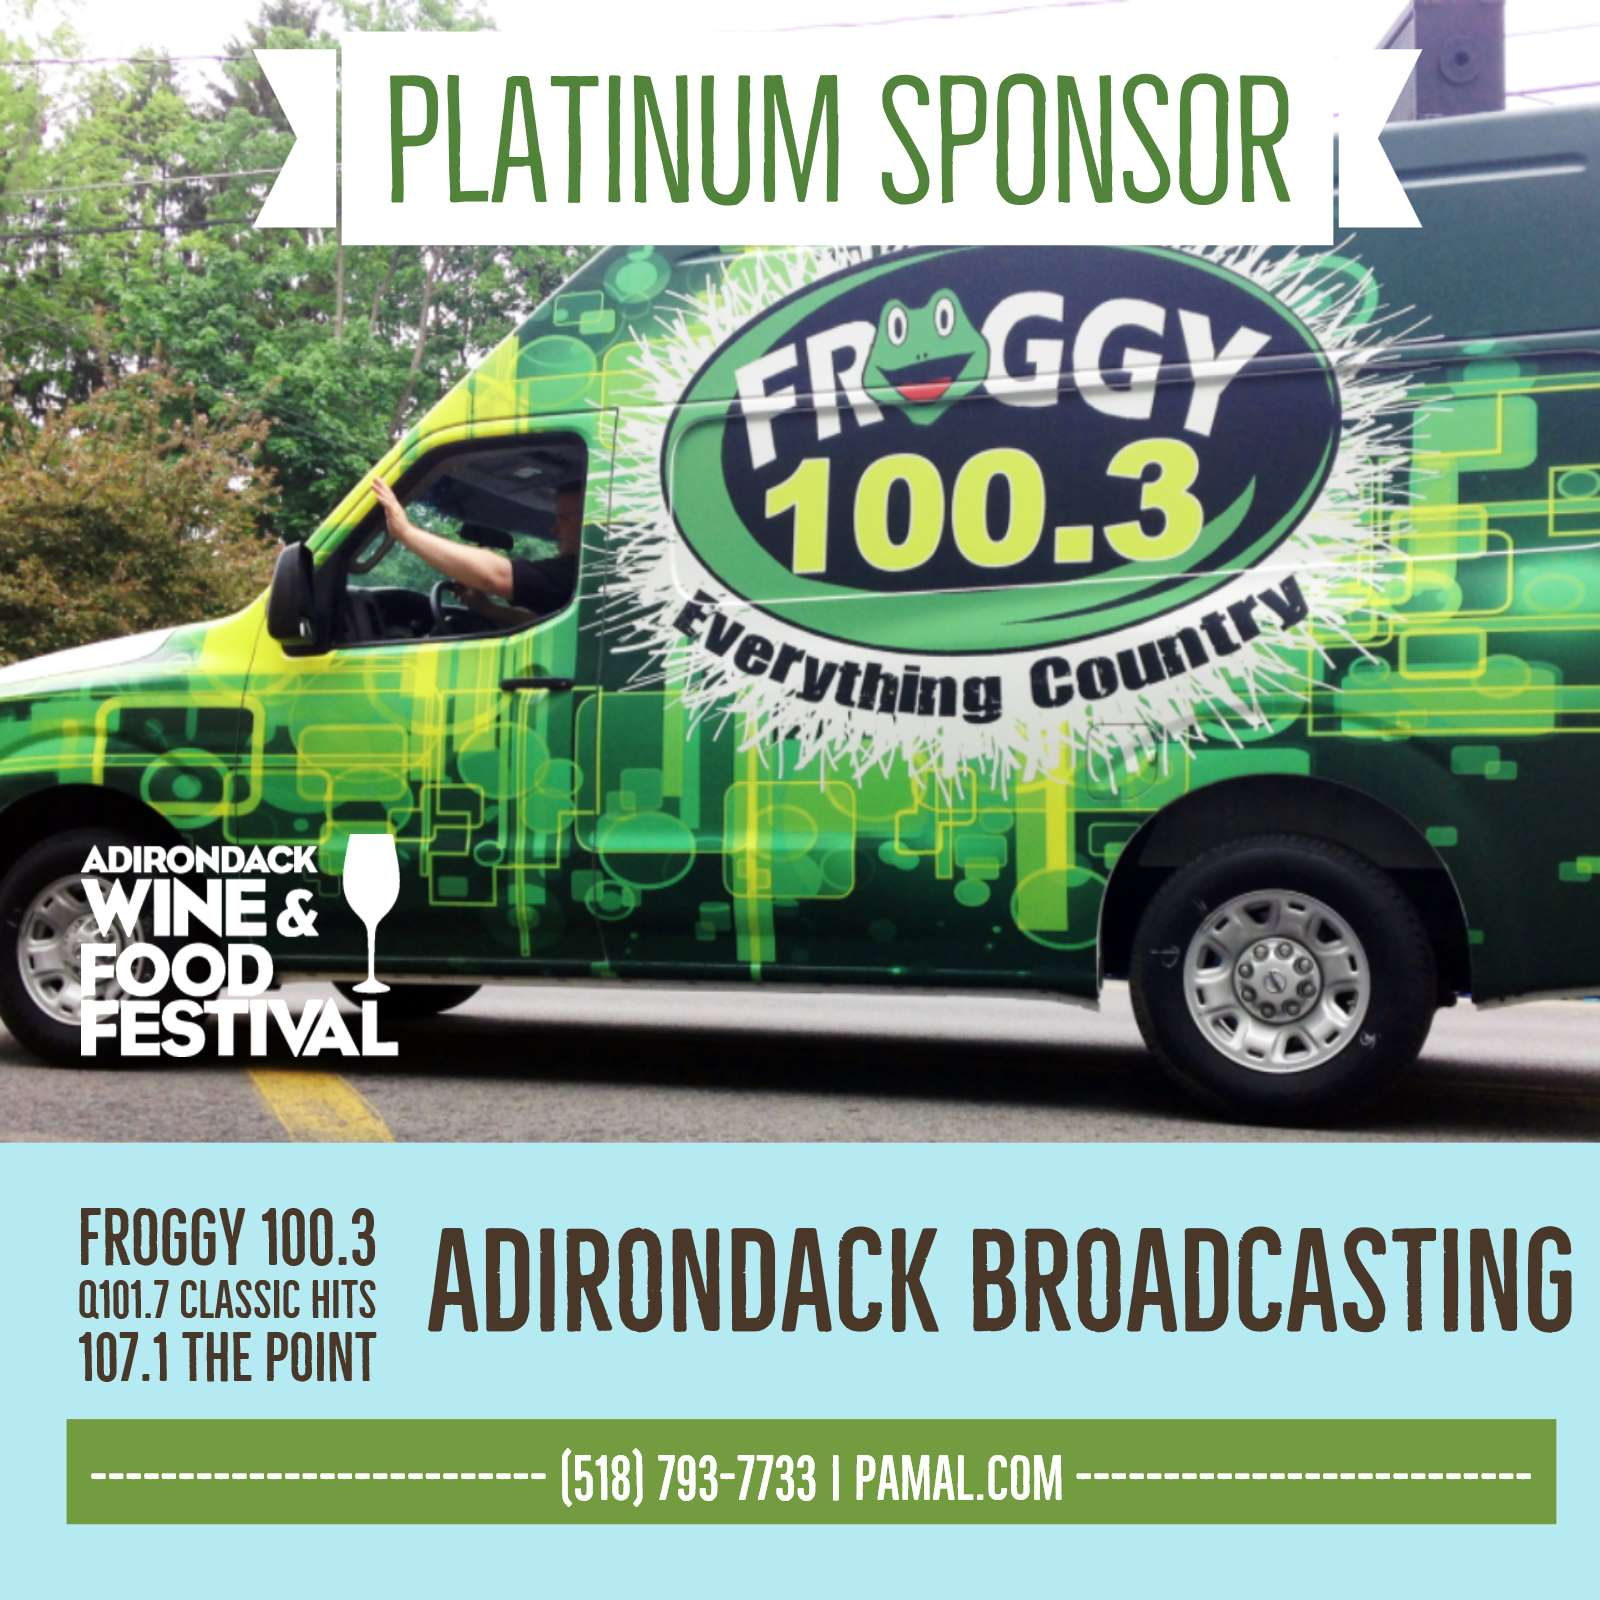 Adirondack Broadcasting